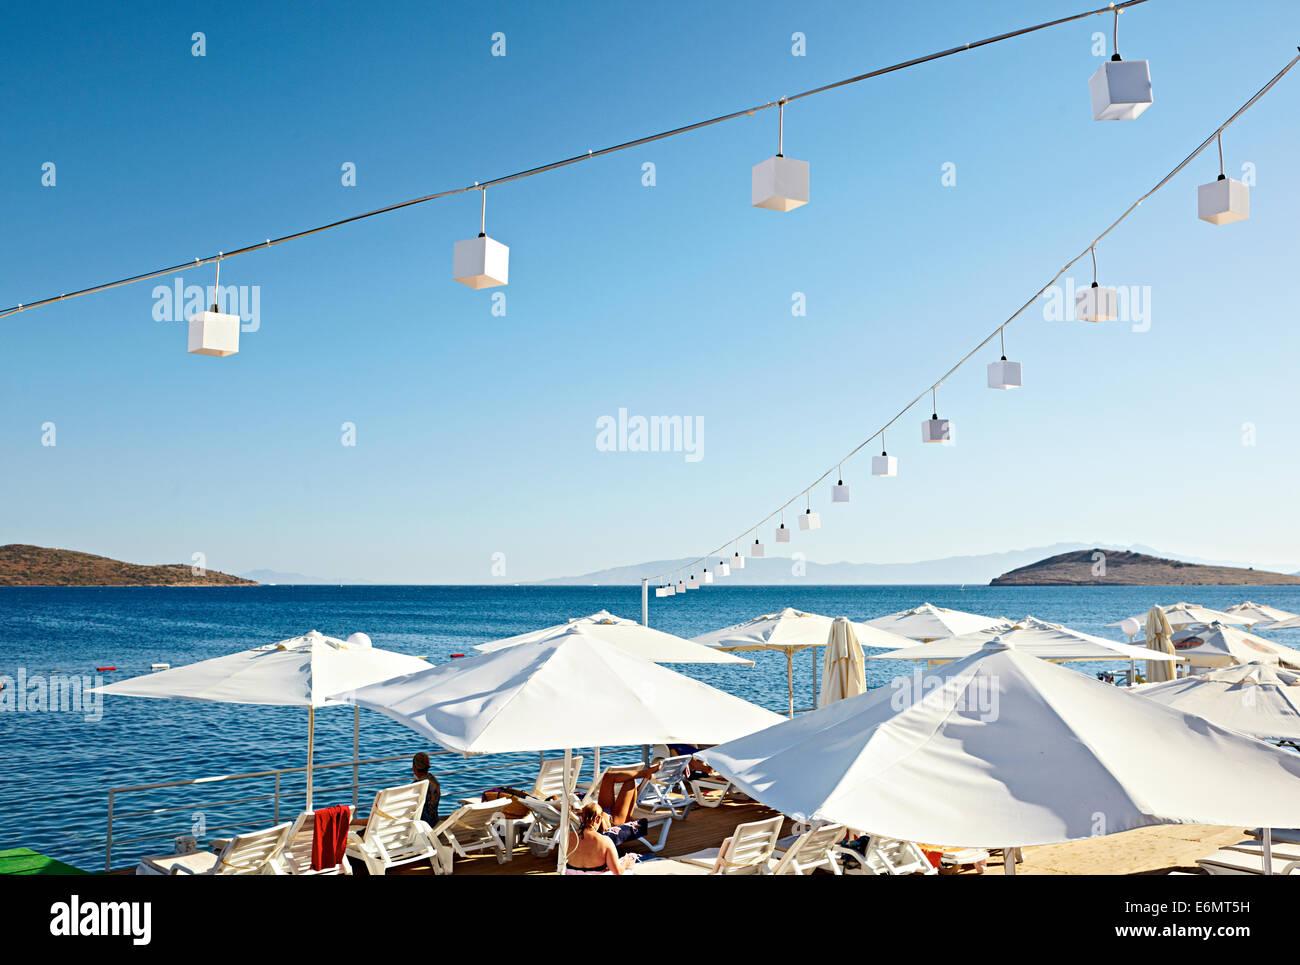 White umbrellas clear blue sky - Stock Image